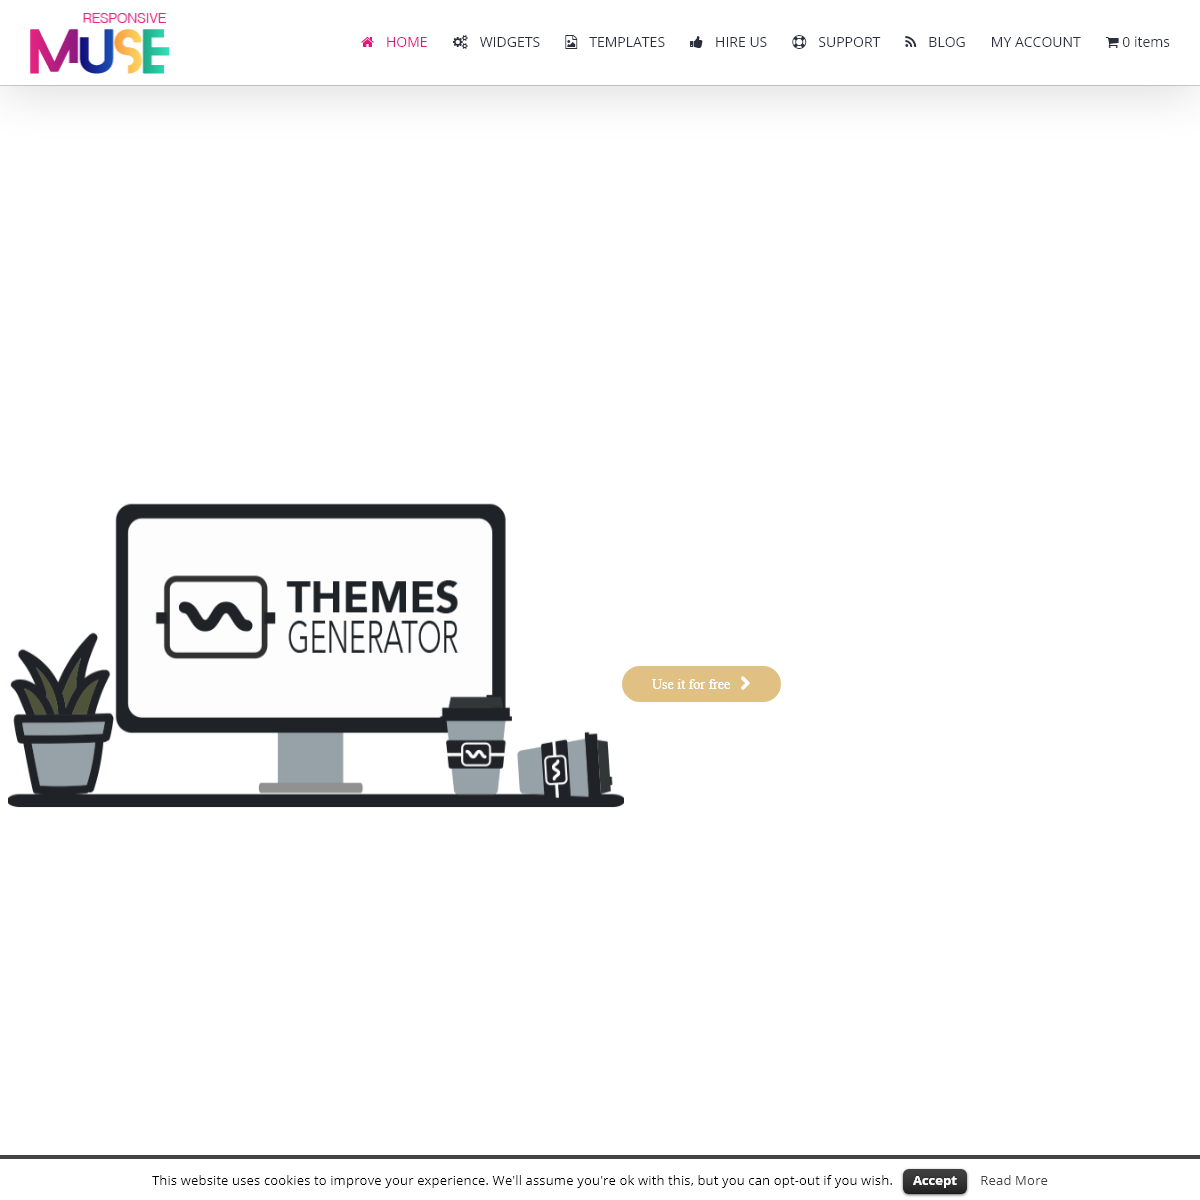 Adobe Muse Templates & Widgets